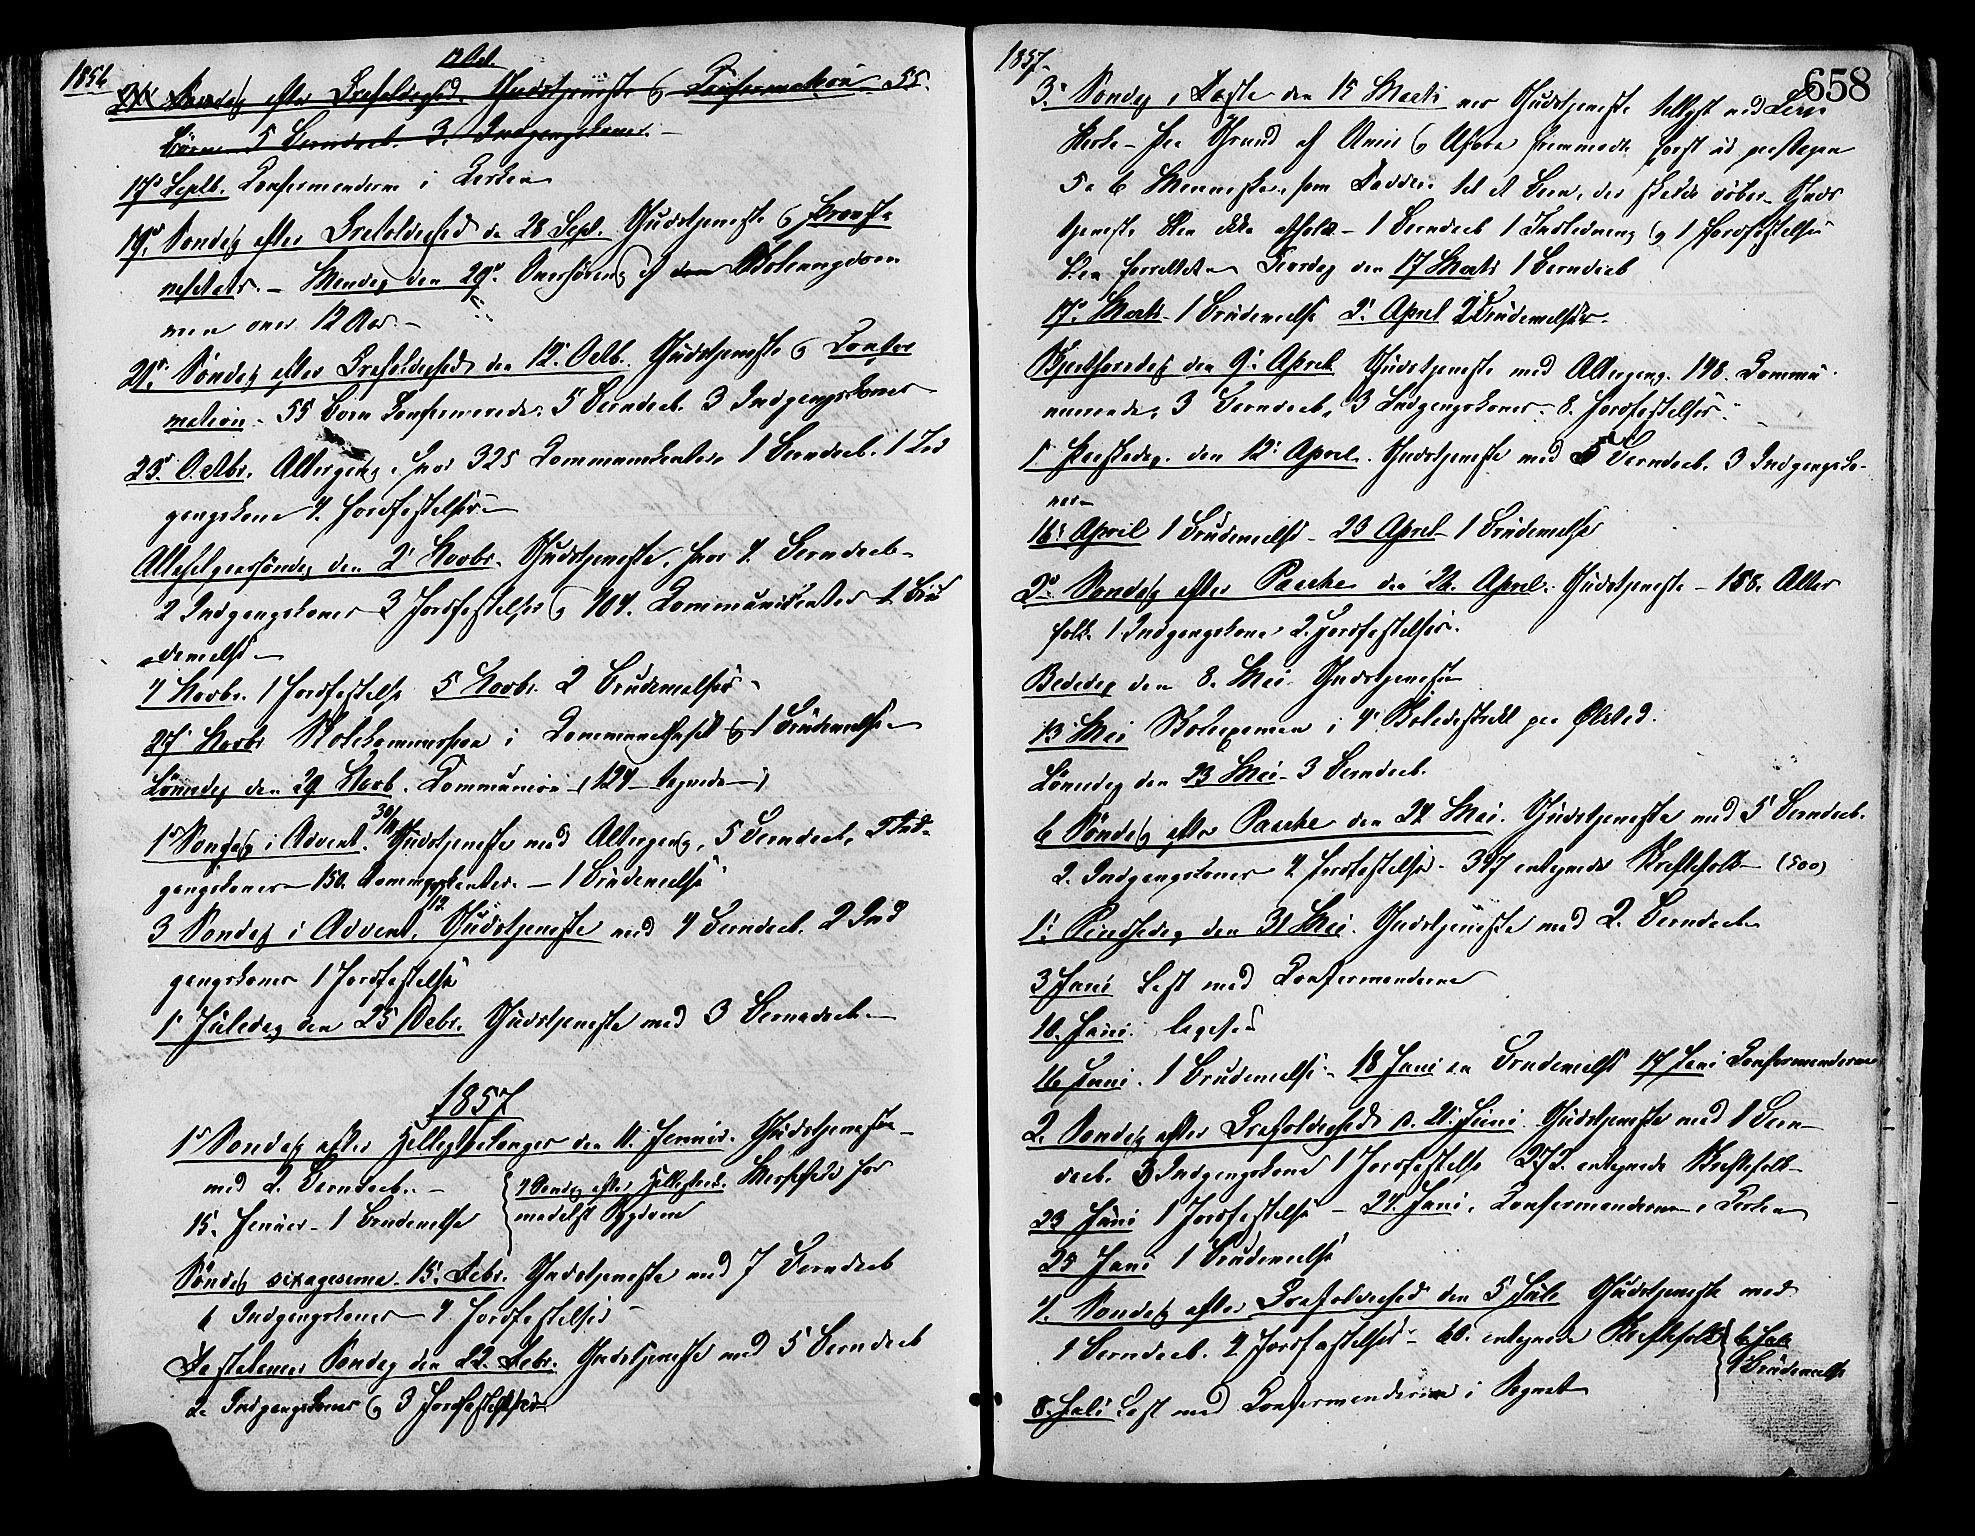 SAH, Lesja prestekontor, Ministerialbok nr. 8, 1854-1880, s. 658